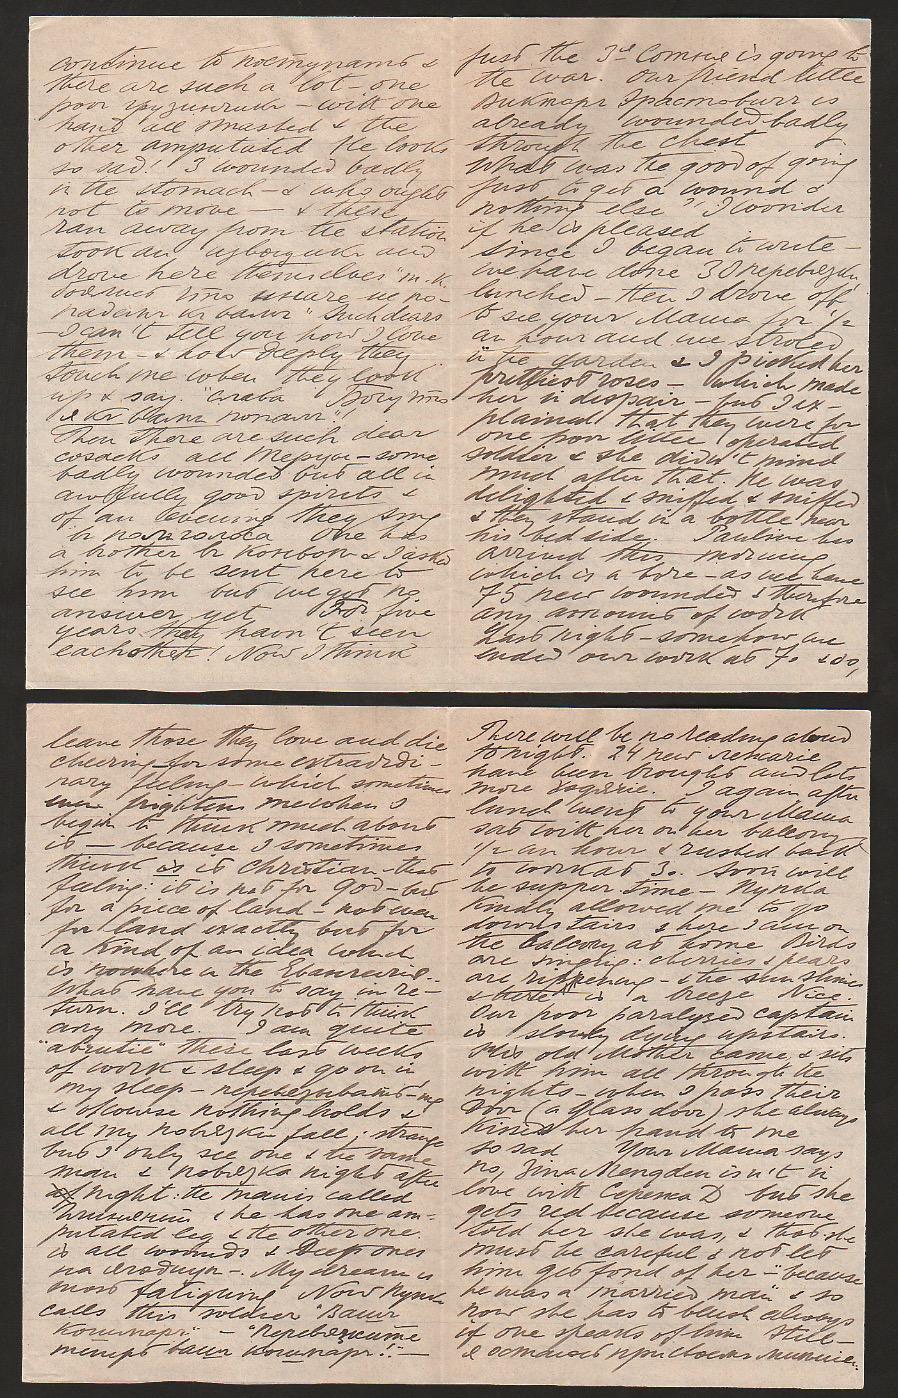 Royalty Grand Duchess Olga Correspondence To Her Sister Grand Duchess Xenia 1916-1920 - Image 38 of 47